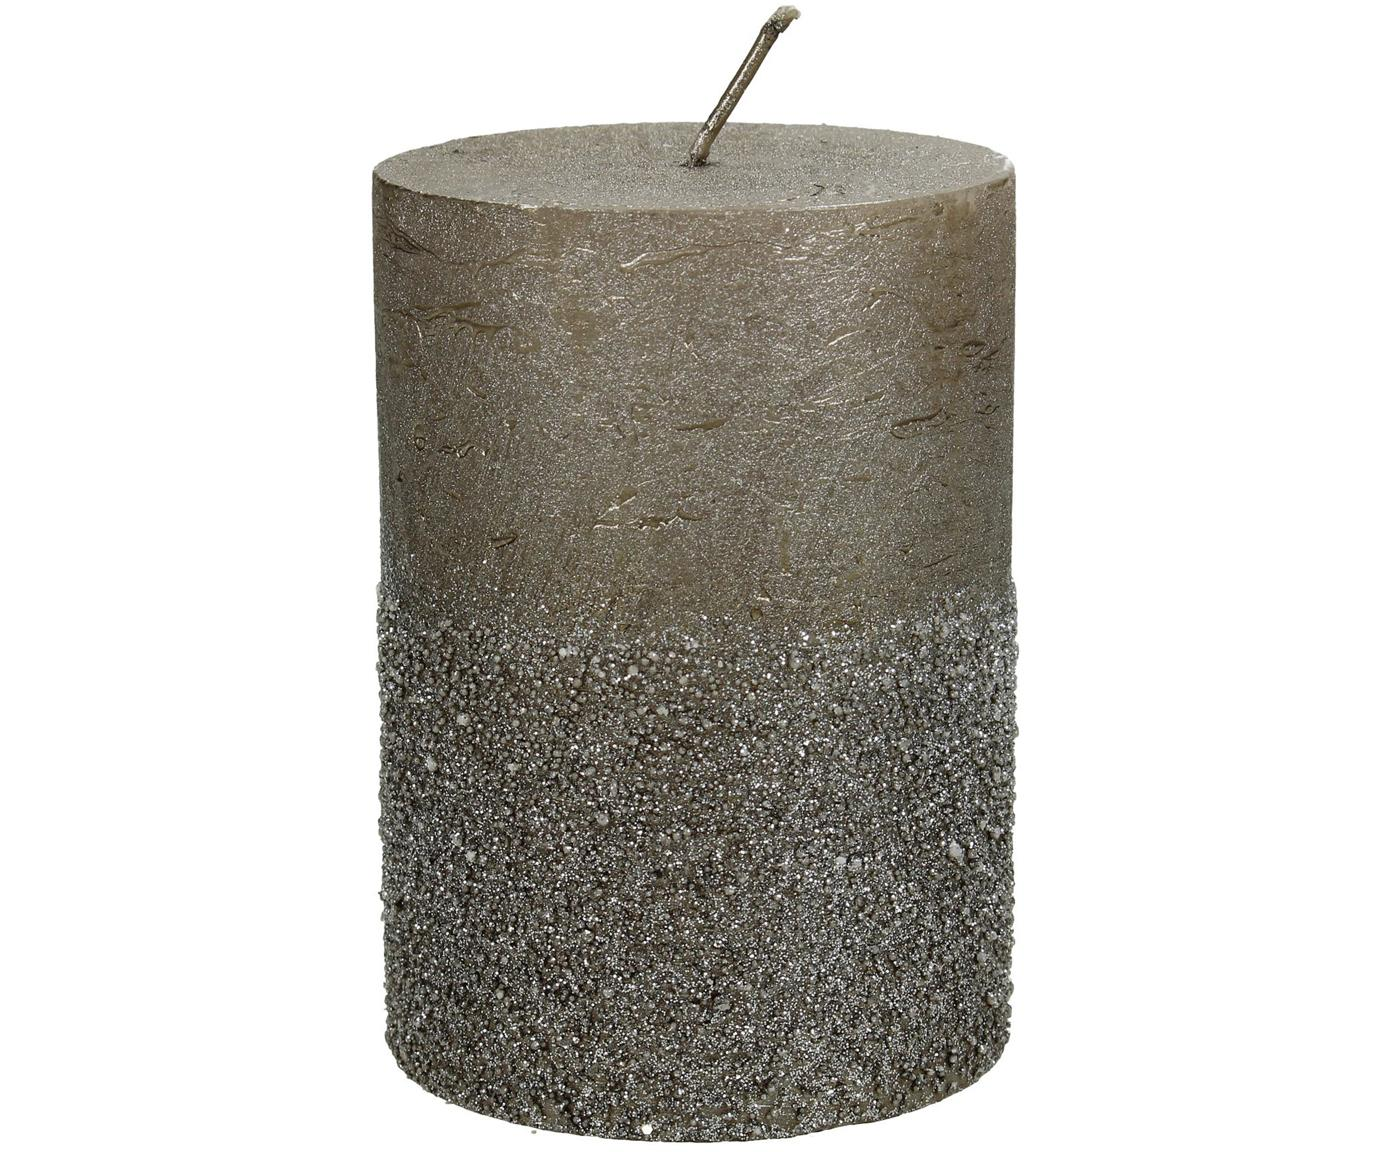 Stumpenkerze Glitters, Wachs, Grau, Ø 7 x H 10 cm